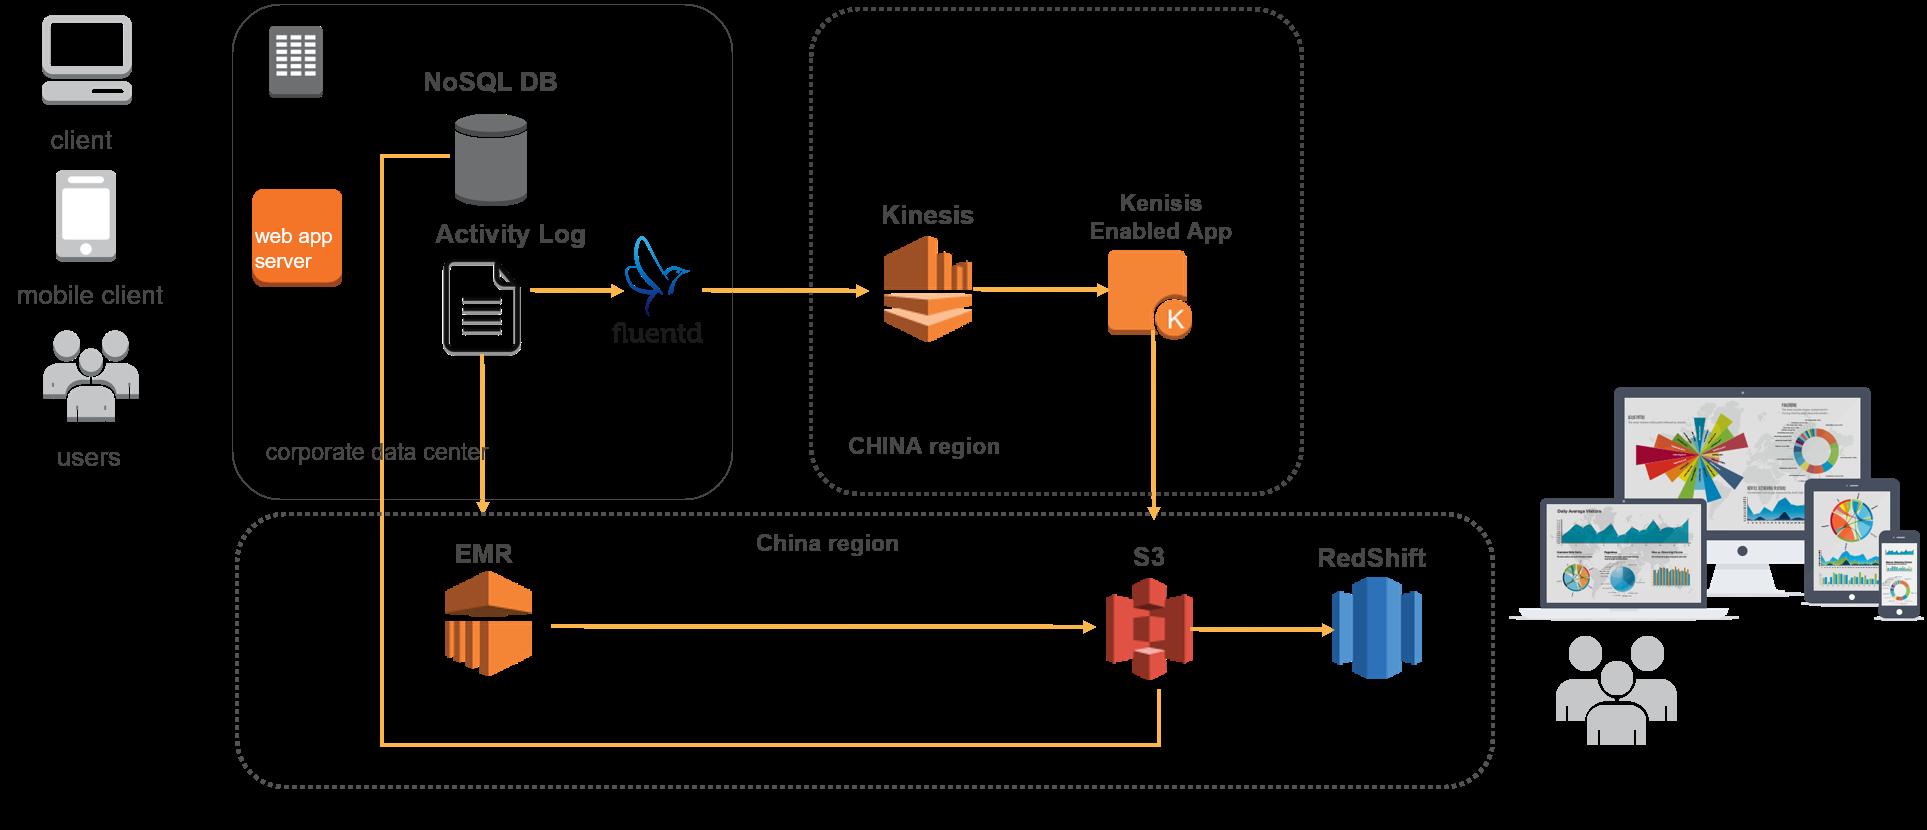 Amazon Redshift构建新一代数据分析BI系统Amazon Redshift构建新一代数据分析BI系统